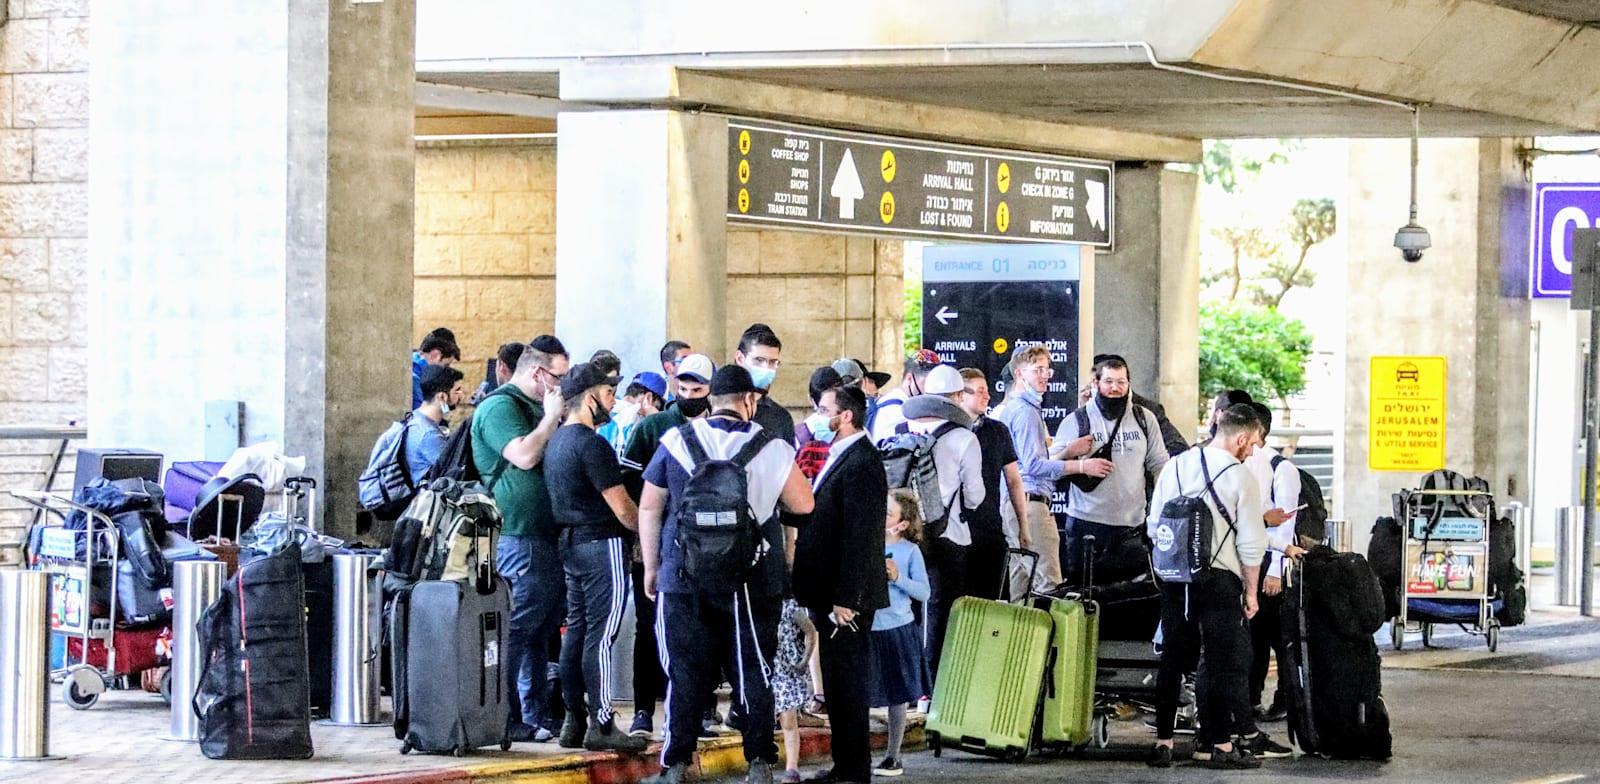 Tourists at airport Photo: Shlomi Yosef